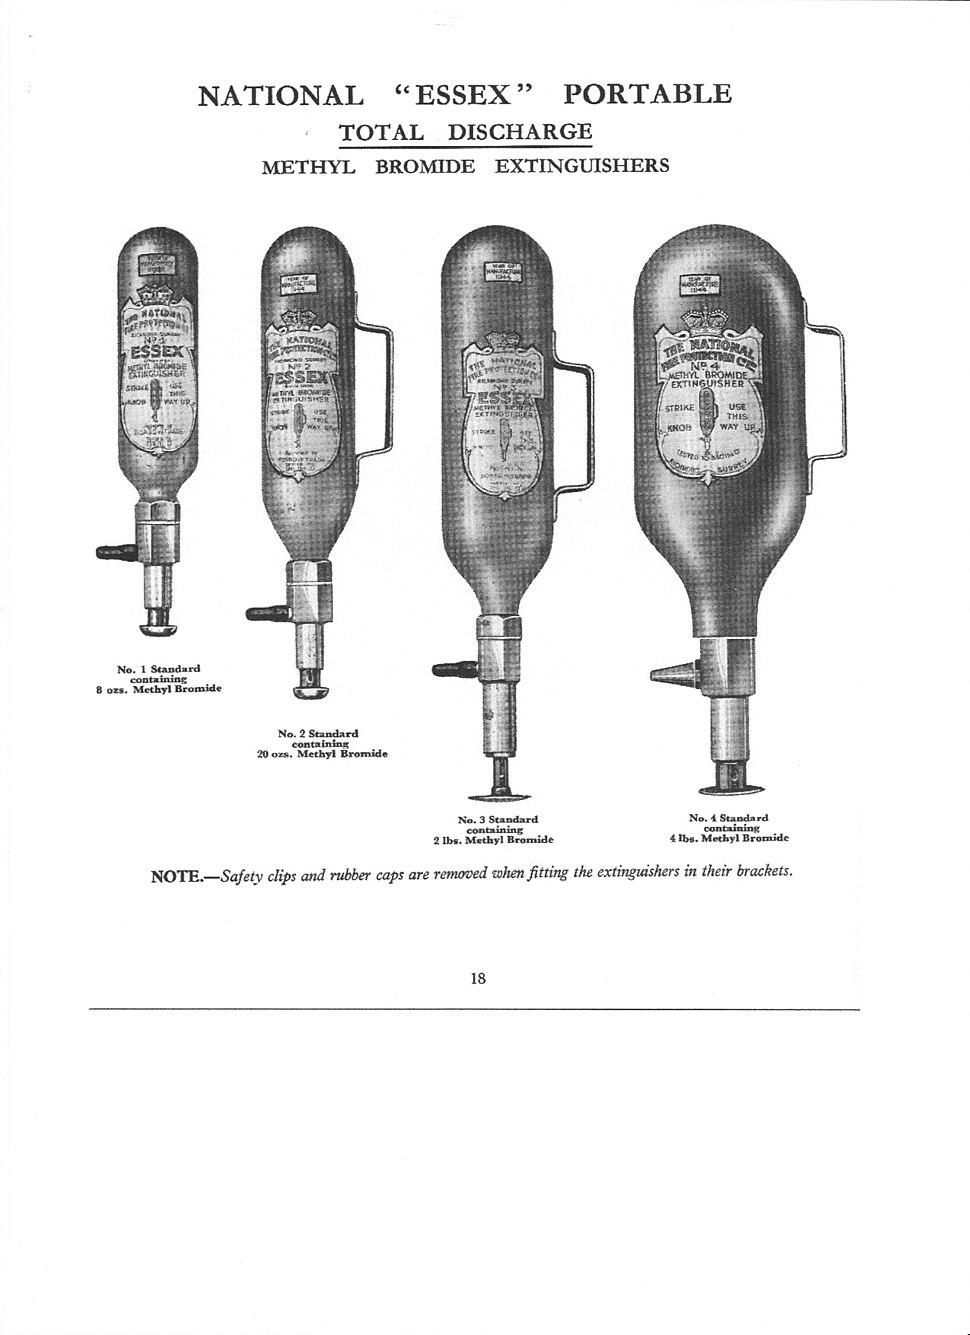 National Methyl Bromide extinguisher